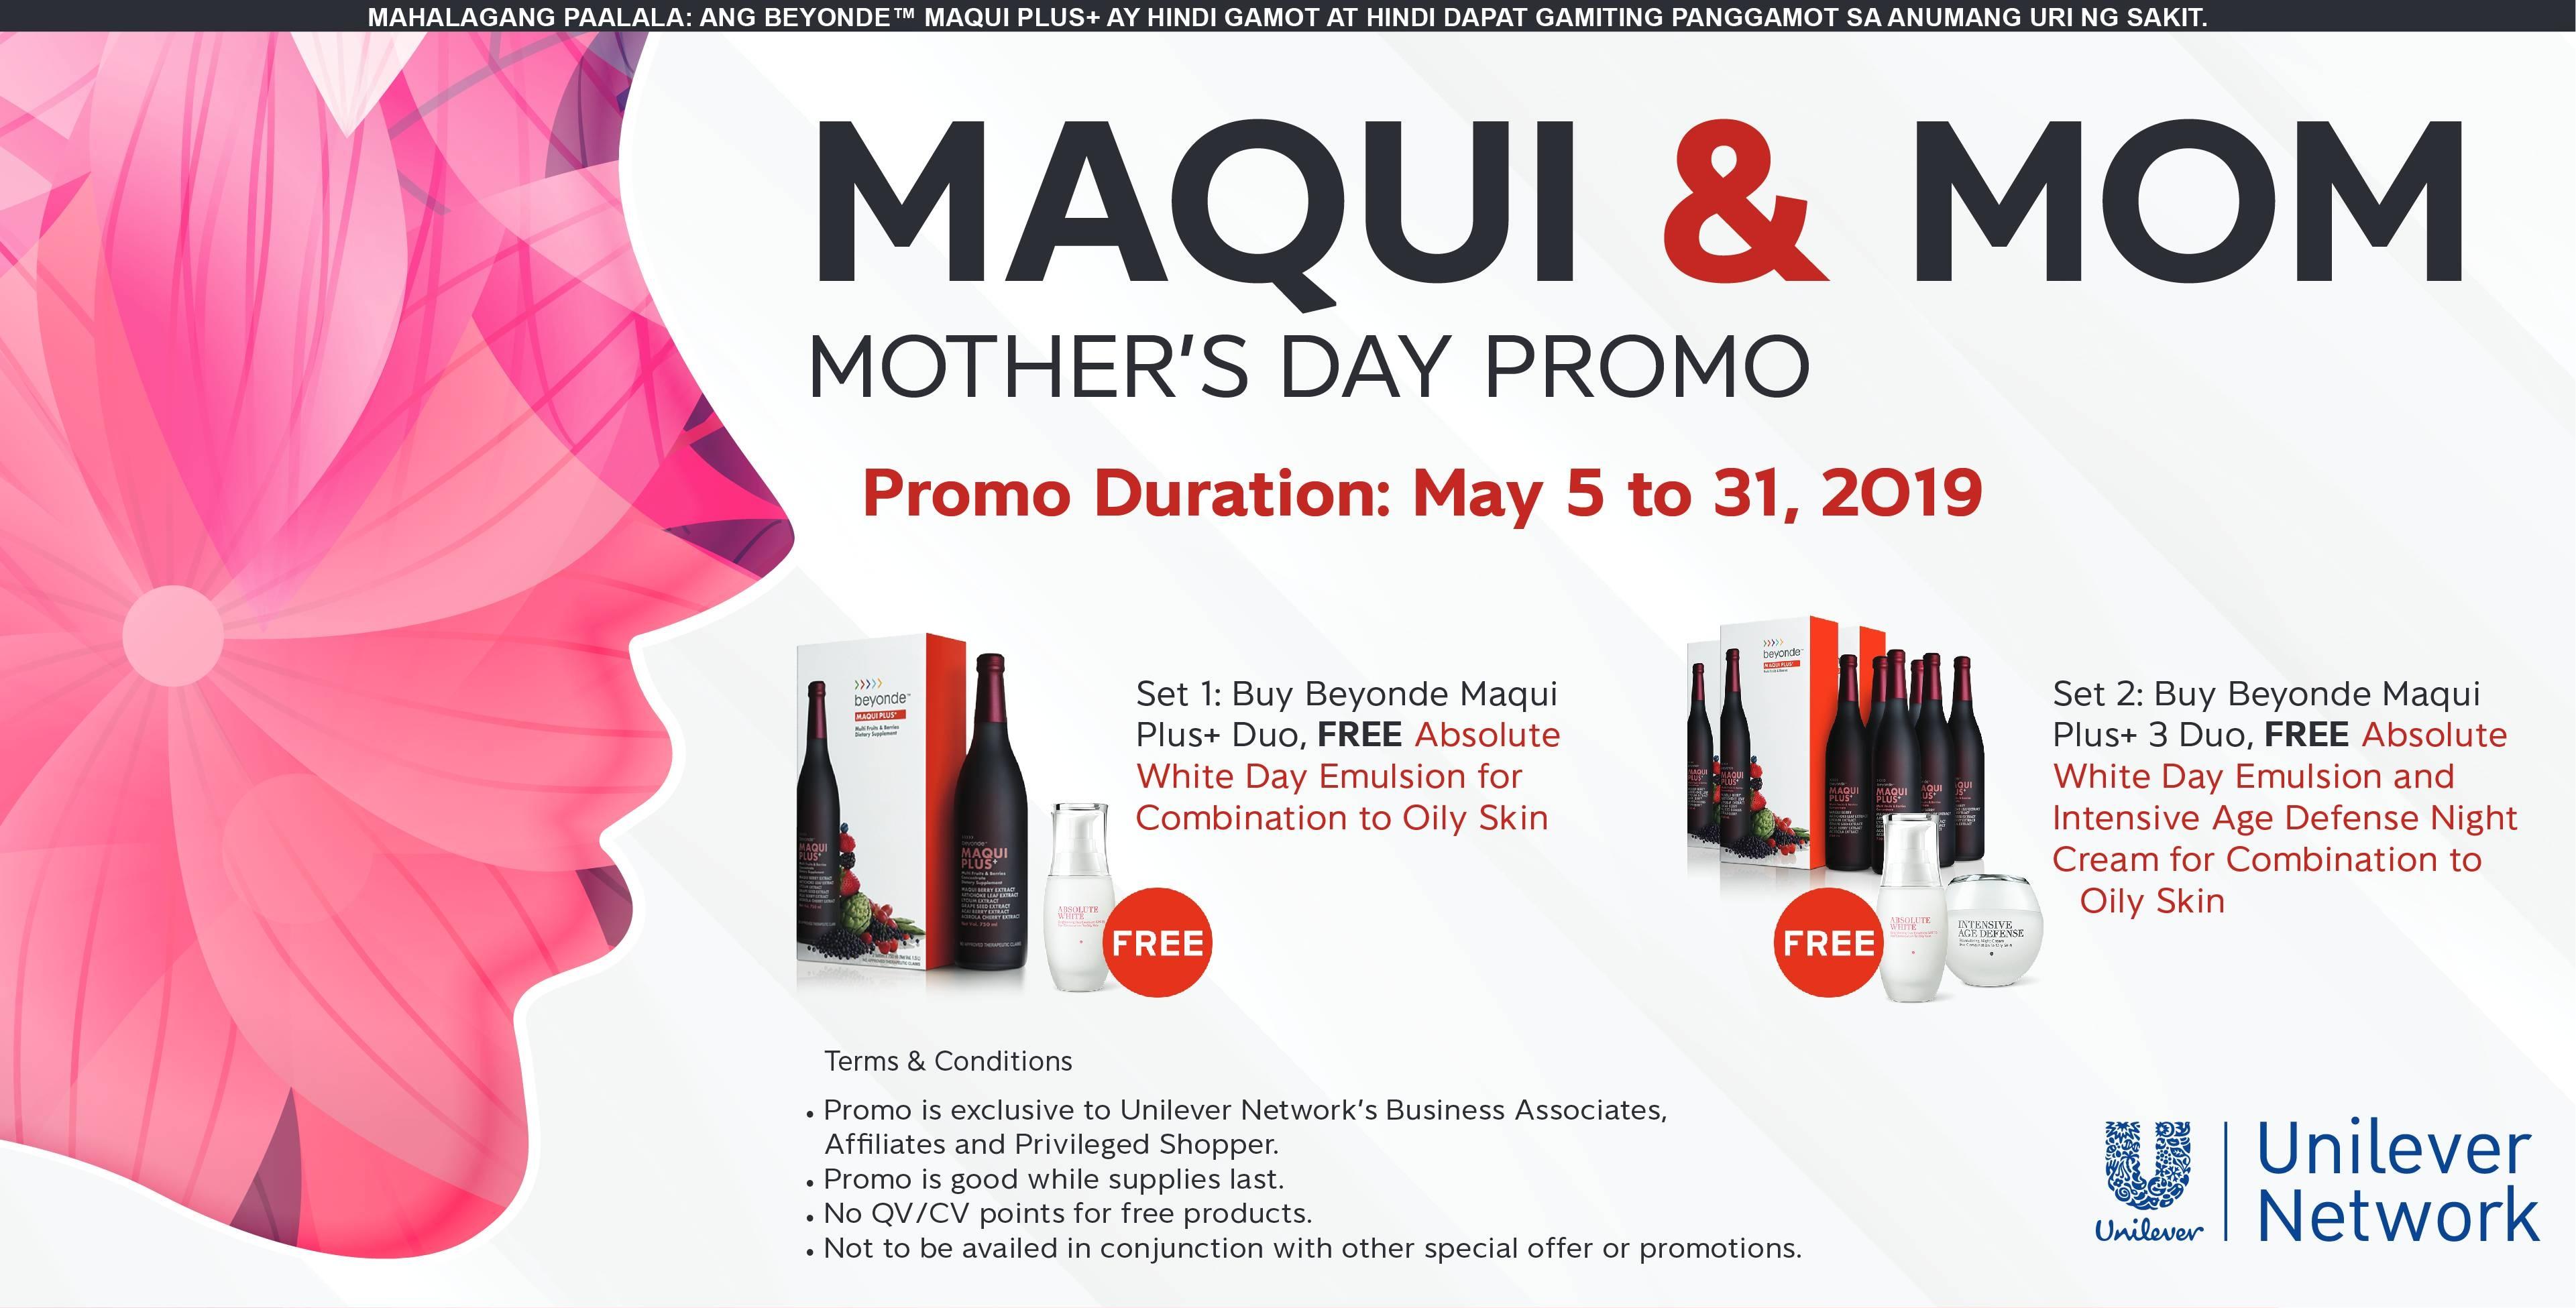 Maqui and Mom 2019